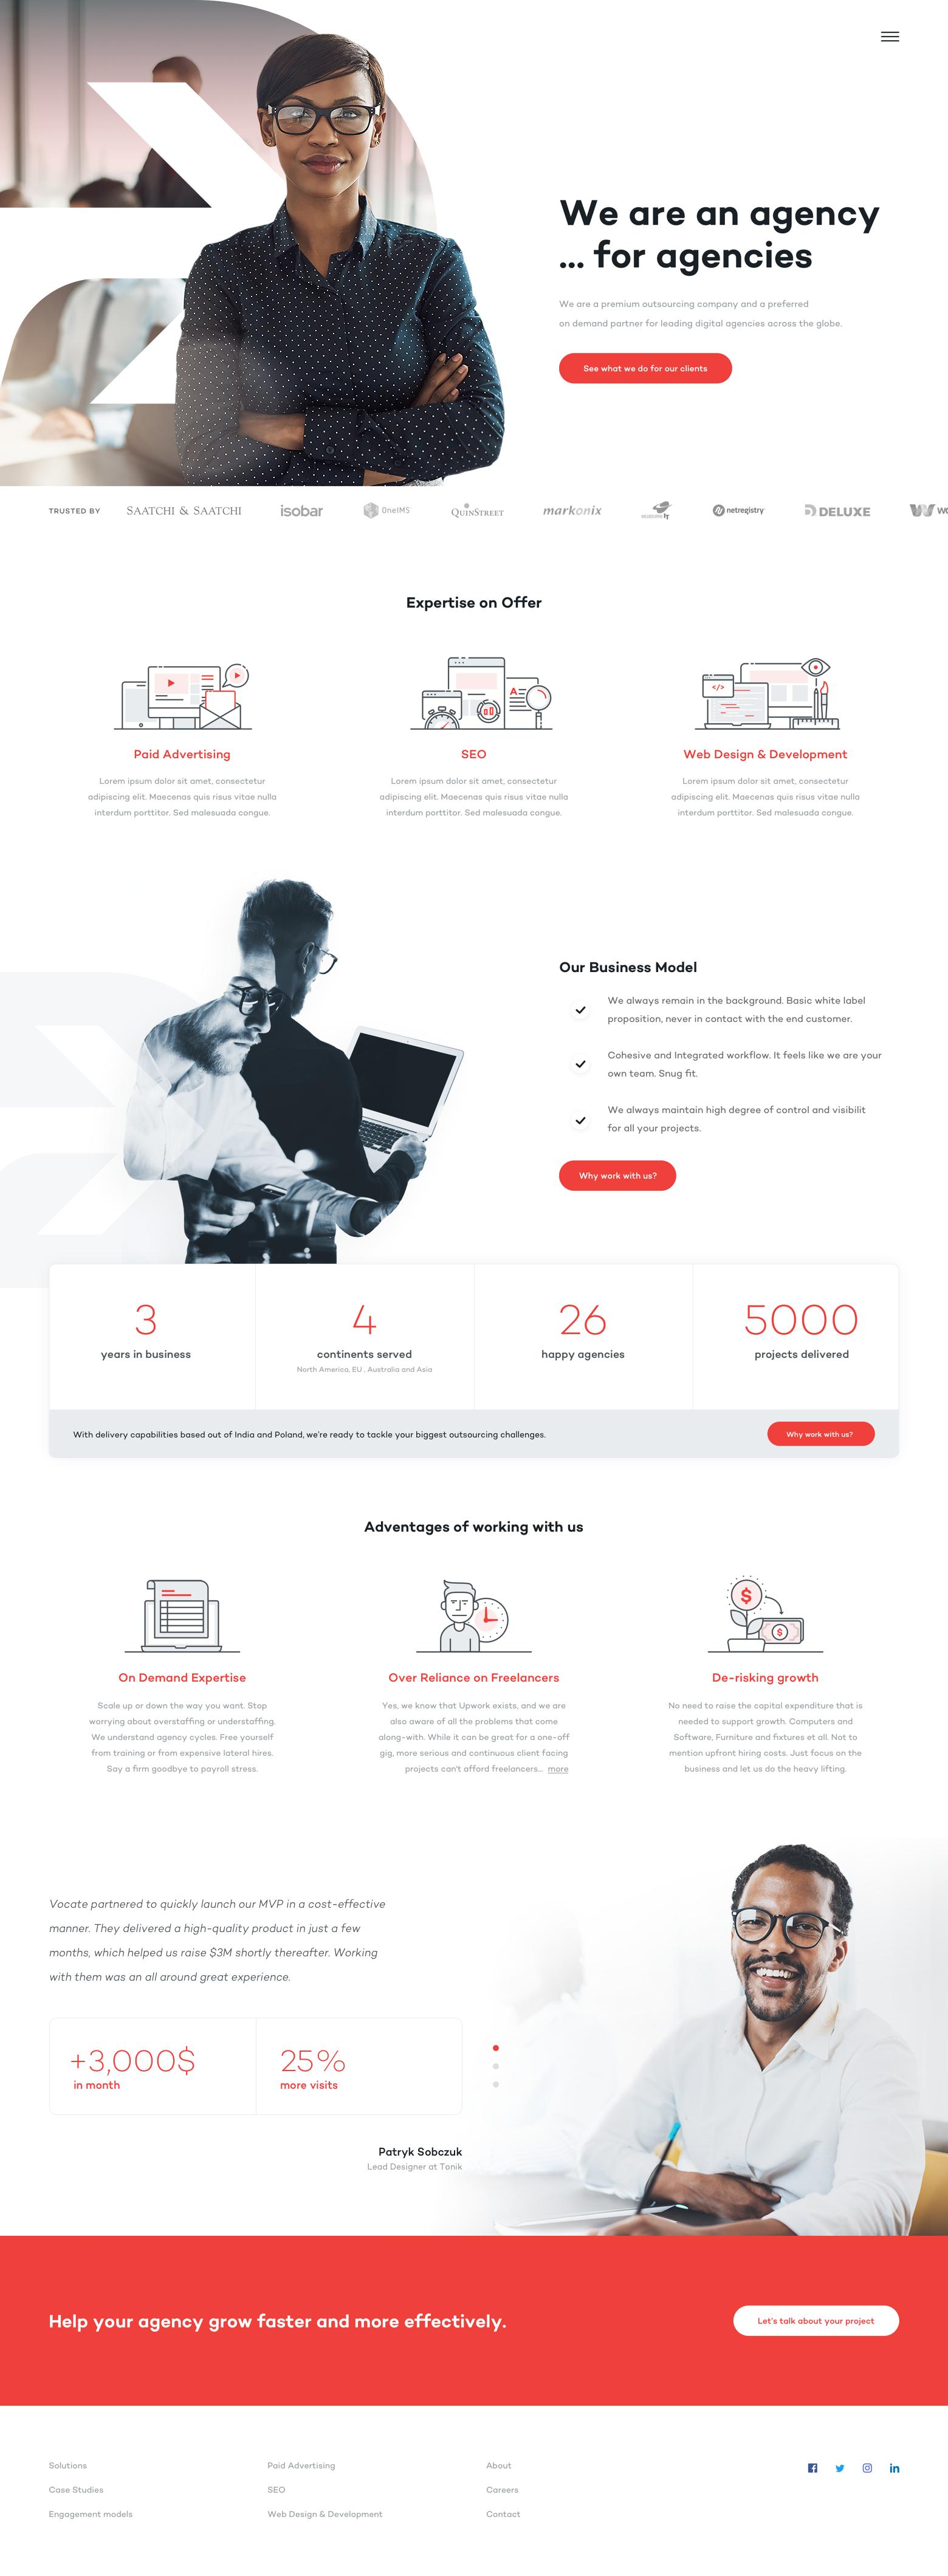 Agency4agency Home Web Design Inspiration Creative Business Web Design Mobile Web Design